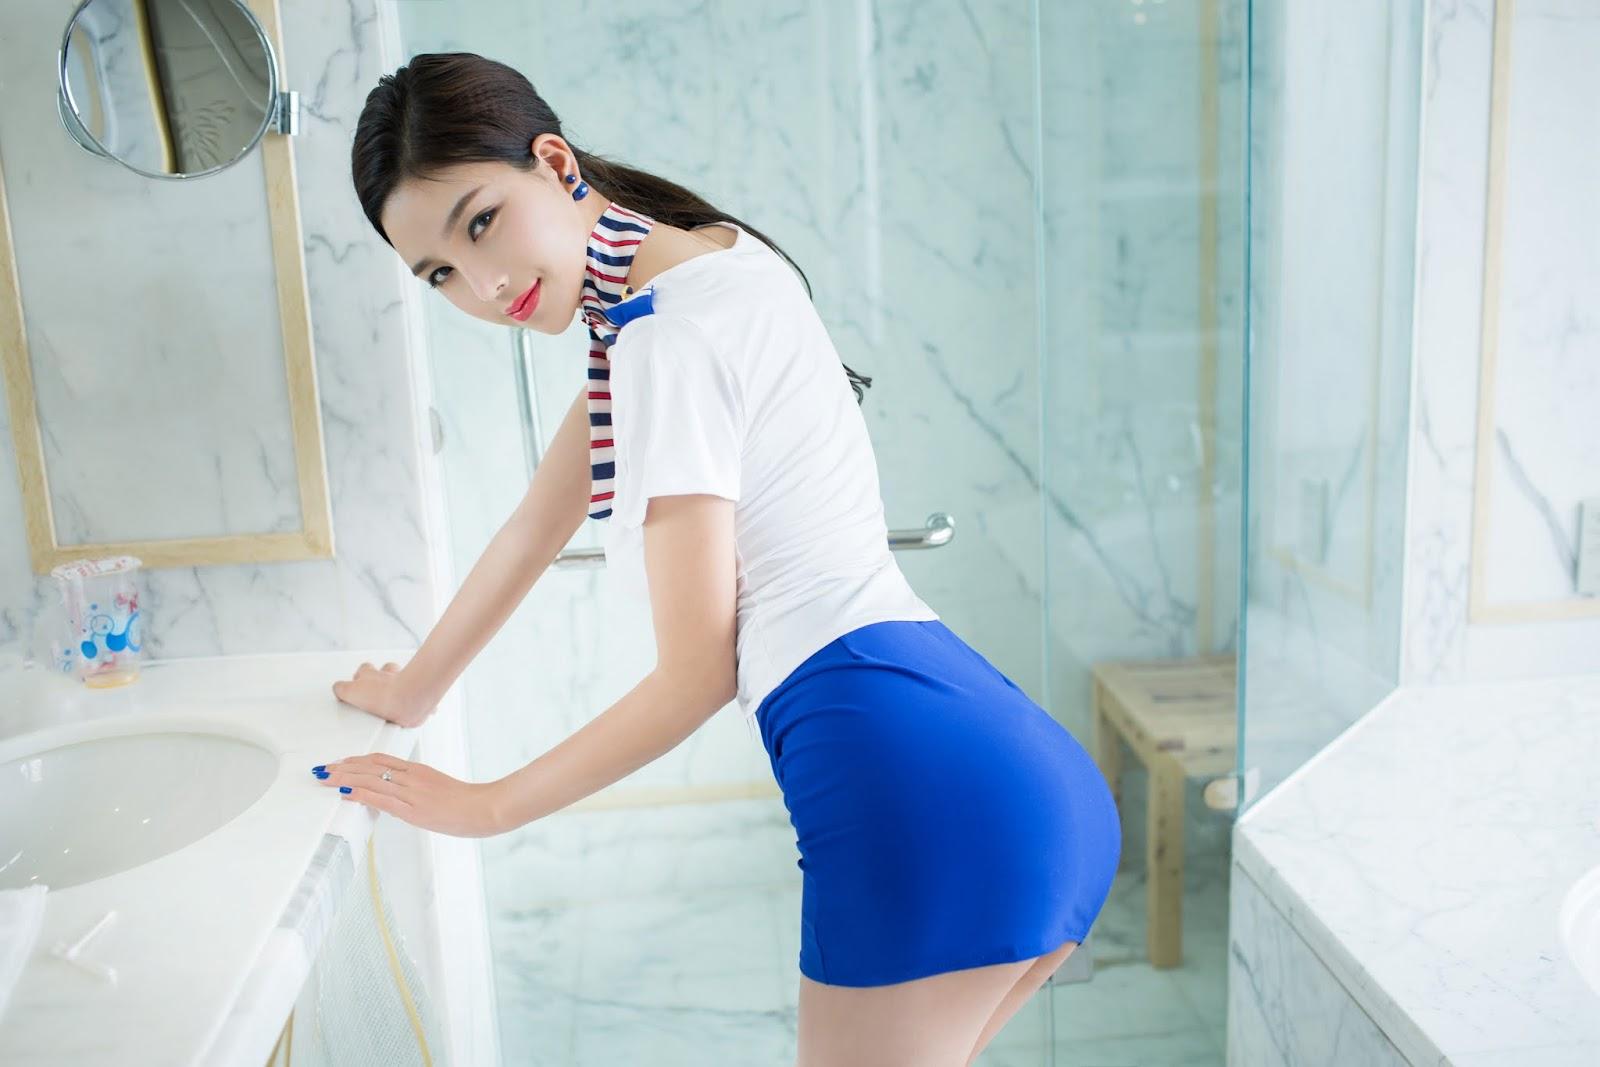 %255BTuiGirl %25C2%25A6%252B%25C2%25AB%252B%252B%255D%2BNo.042%2B%252B%25C3%25BA%252B%253D%252B%2529%2B%25282%2529 - beautiful Asian Model TUIGIRL NO.42